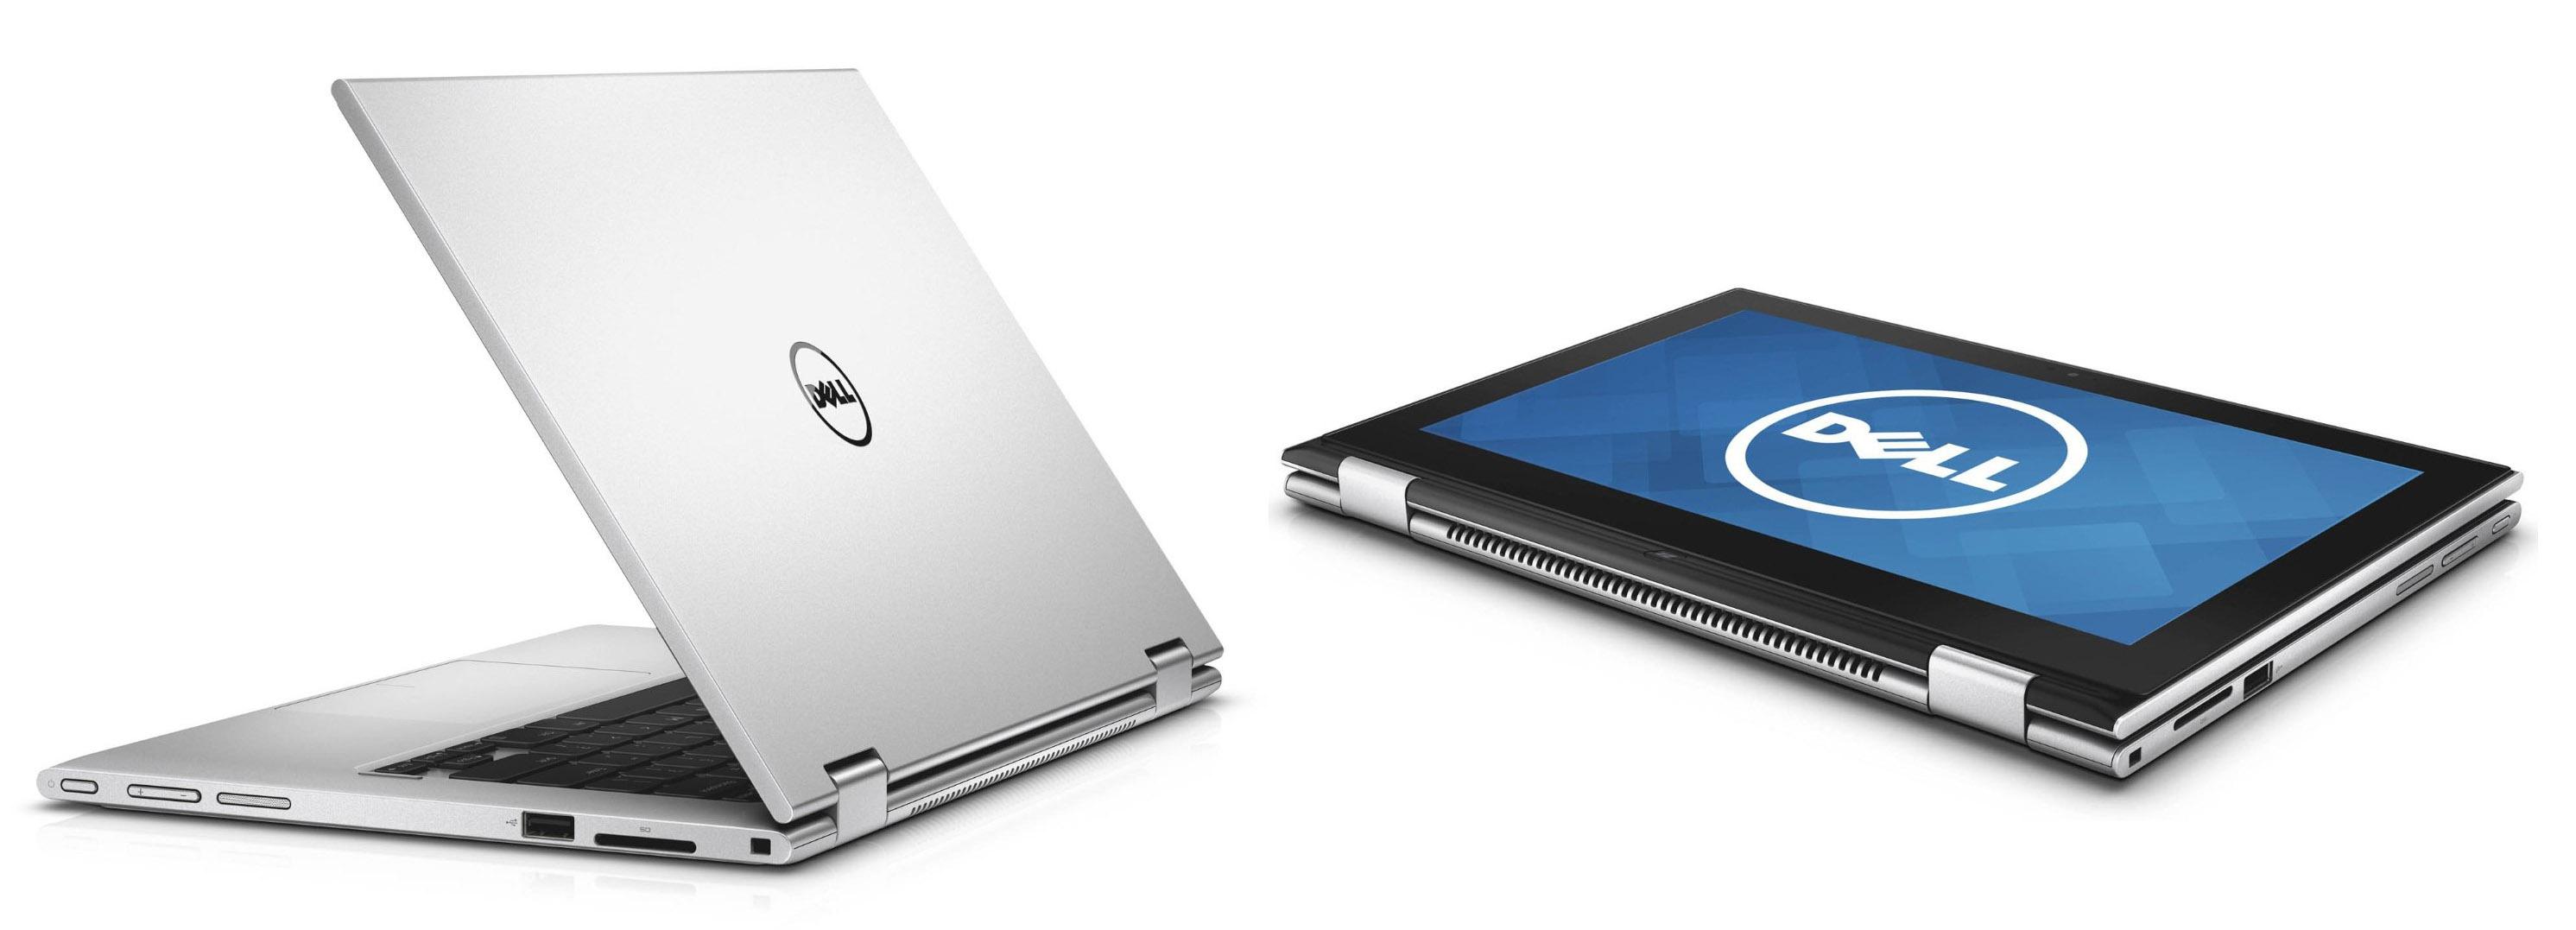 best touchscreen laptop, laptops, best laptops, graduation gifts